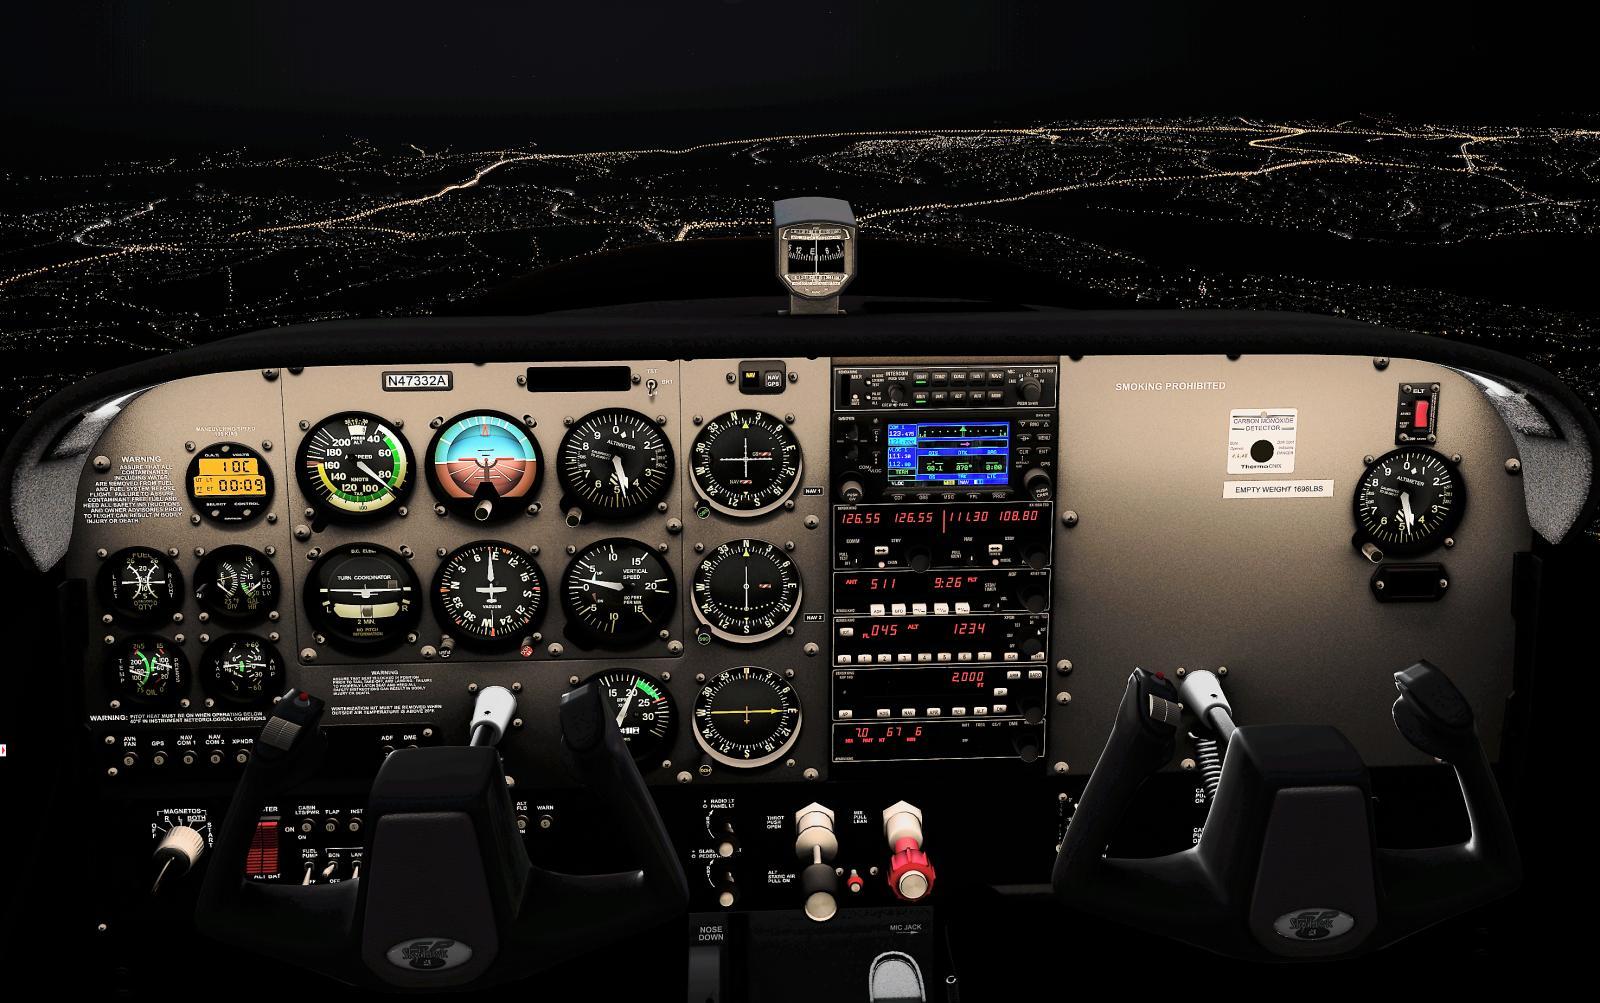 İsim:  Airfoillabs_C172SP_high_res_16.jpg Görüntüleme: 332 Büyüklük:  233.4 KB (Kilobyte)